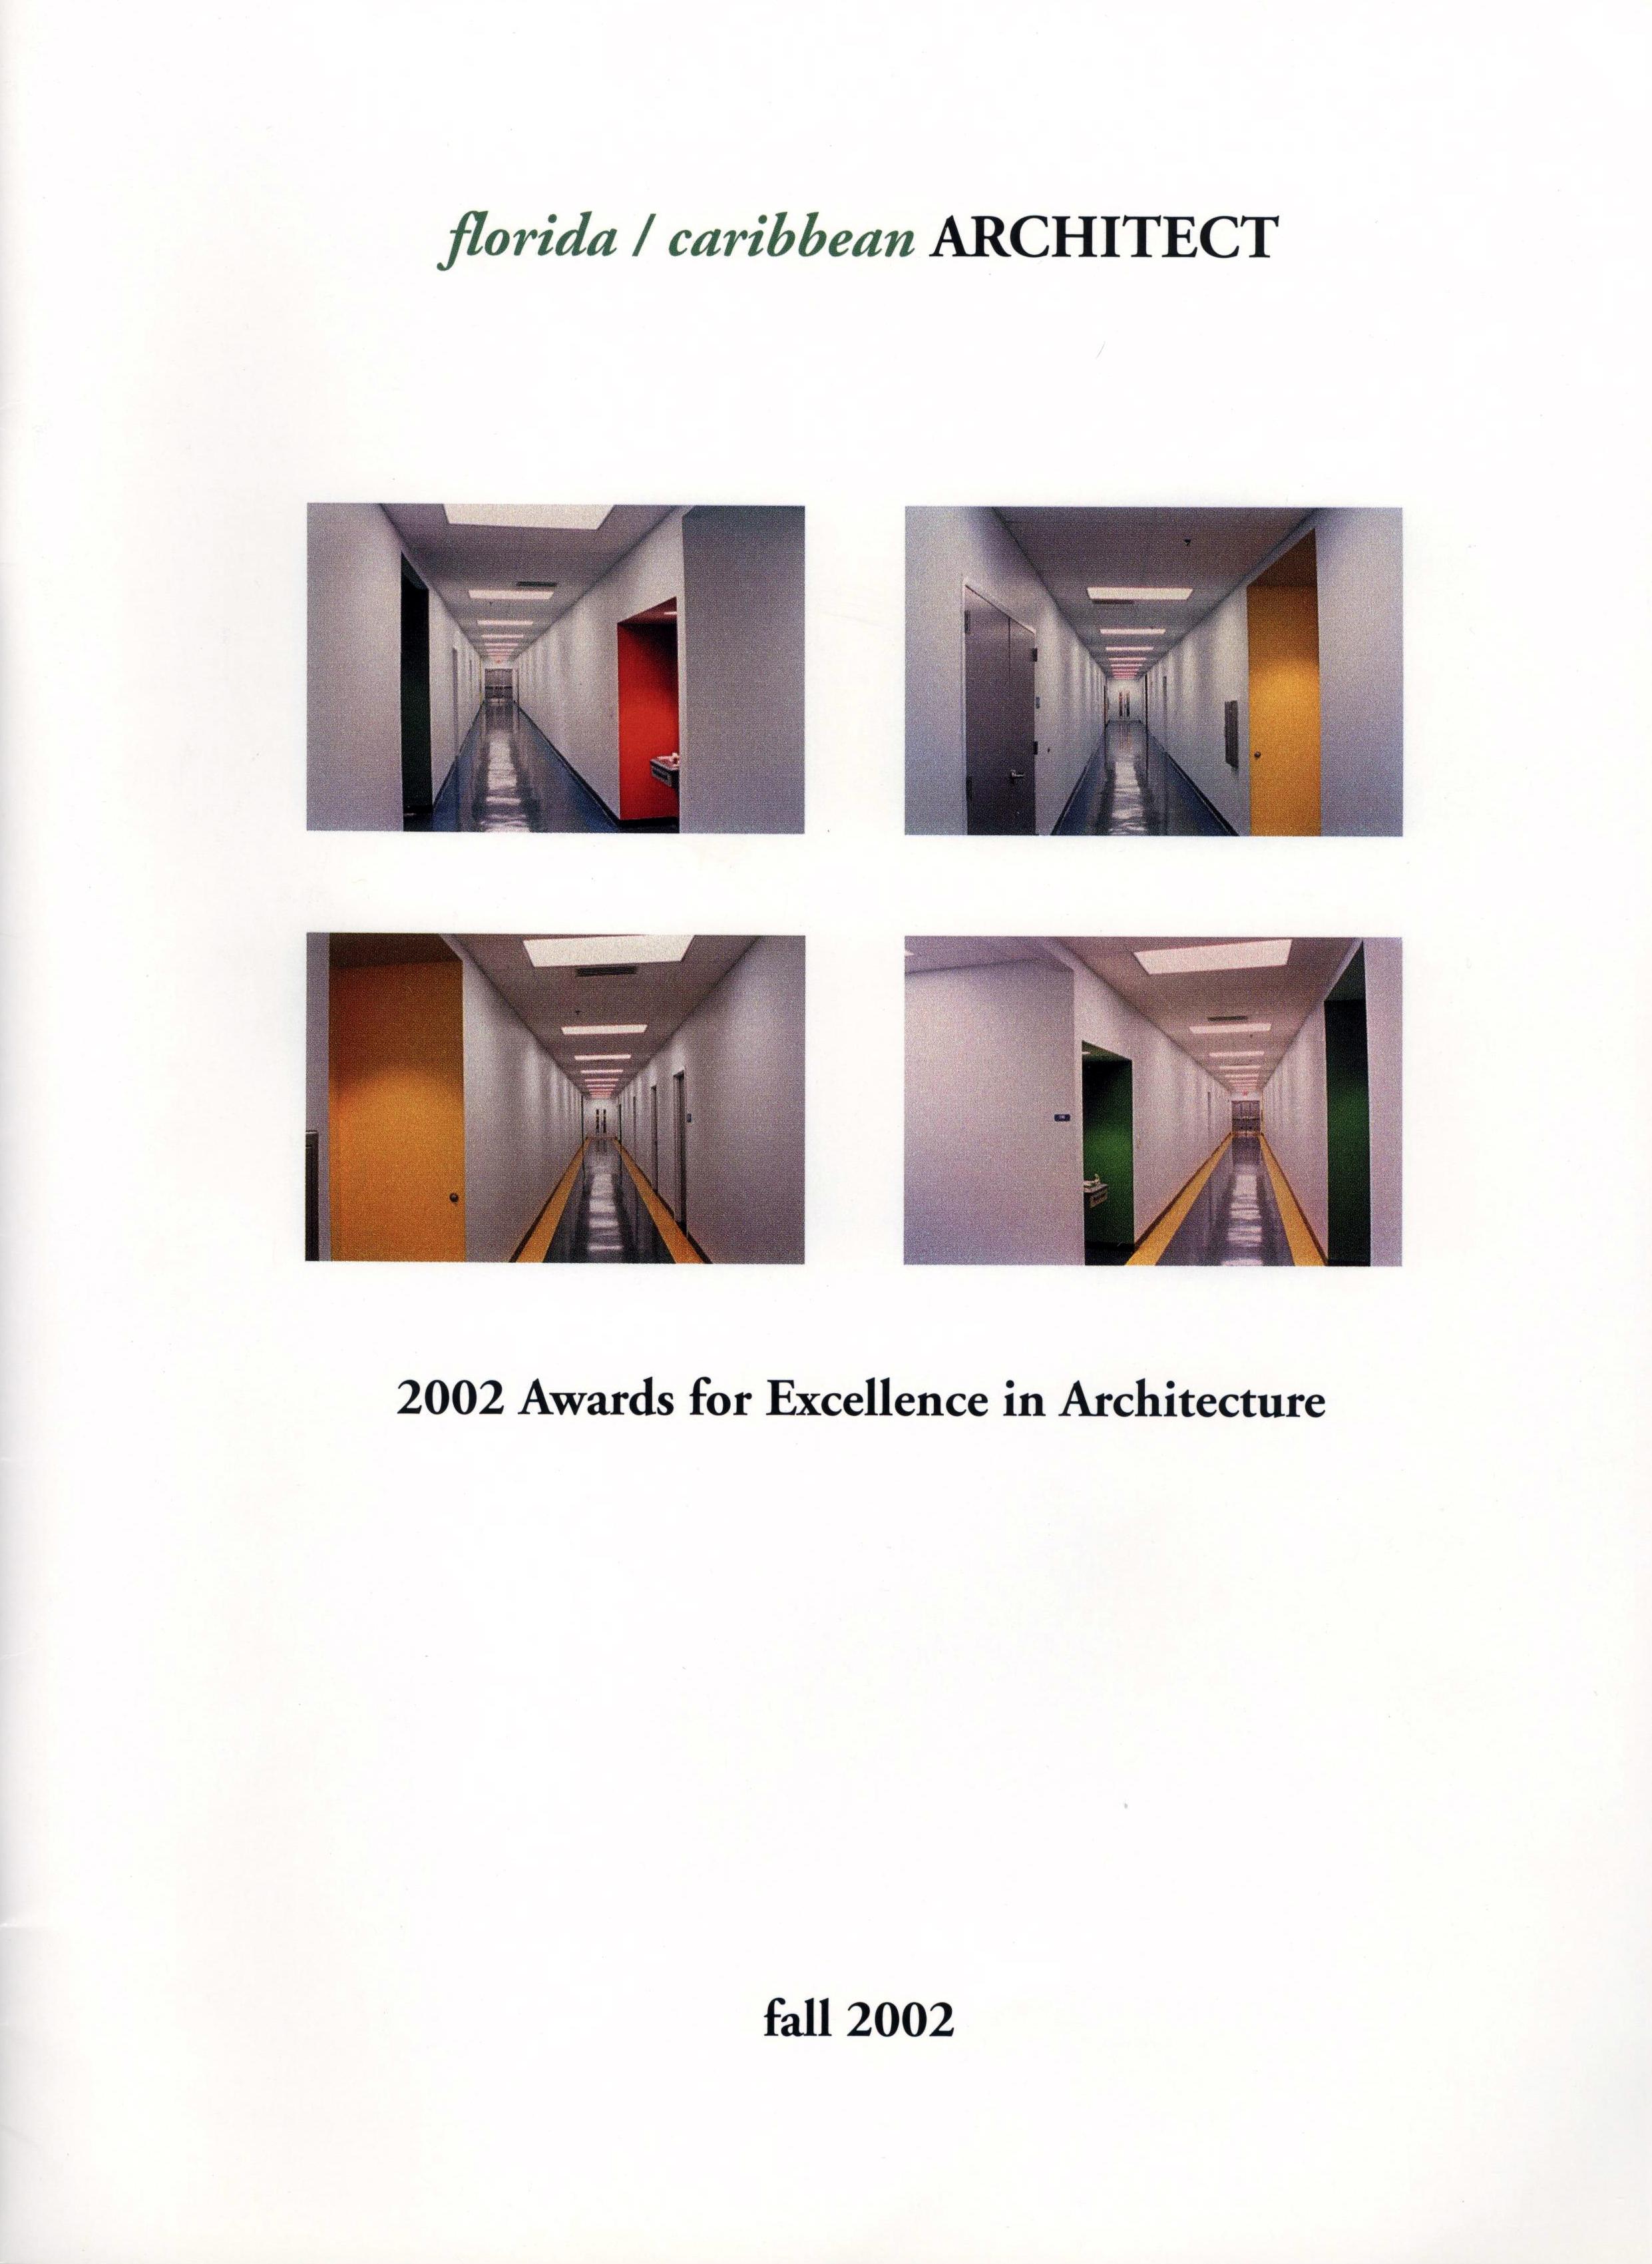 Florida Architect 2002 (Publications) 001 SC-10.jpg